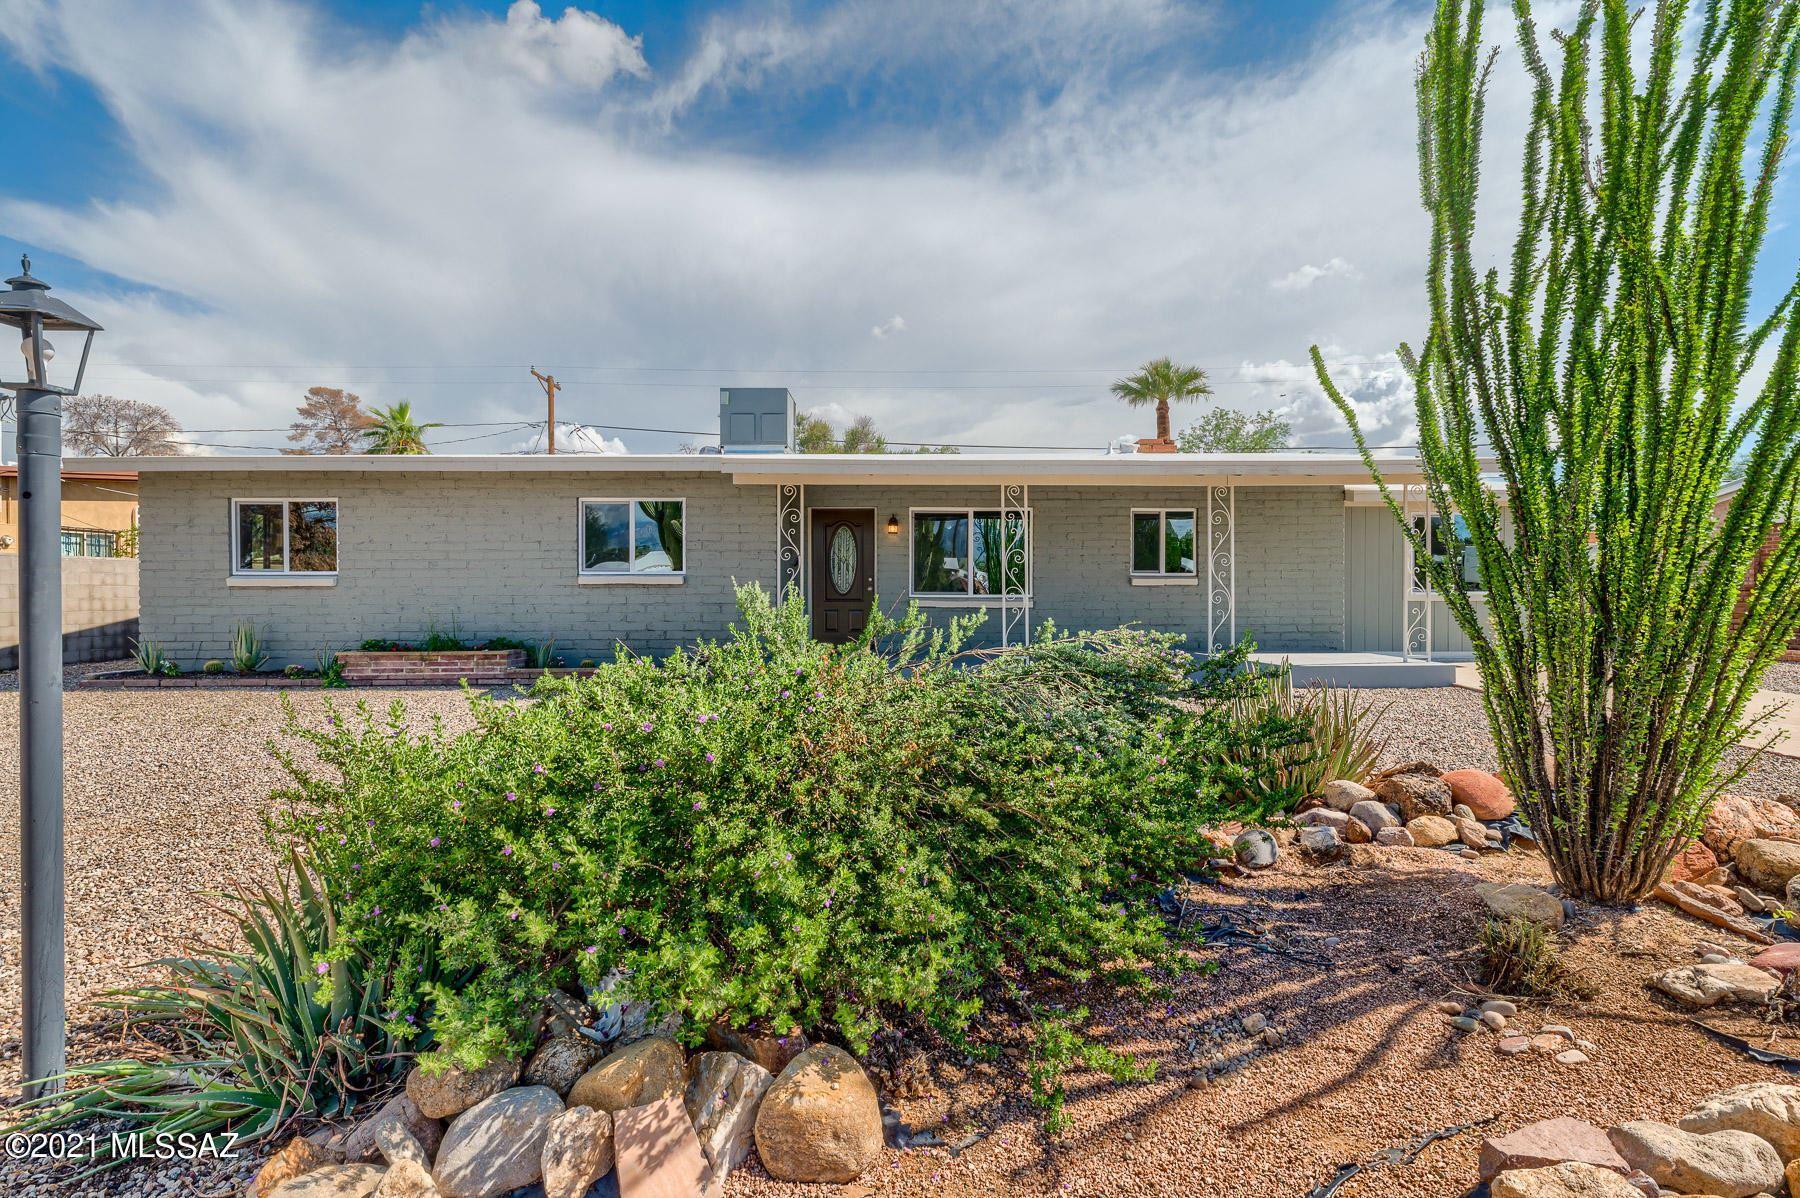 6052 E 17Th Street, Tucson, AZ 85711 - MLS#: 22120759